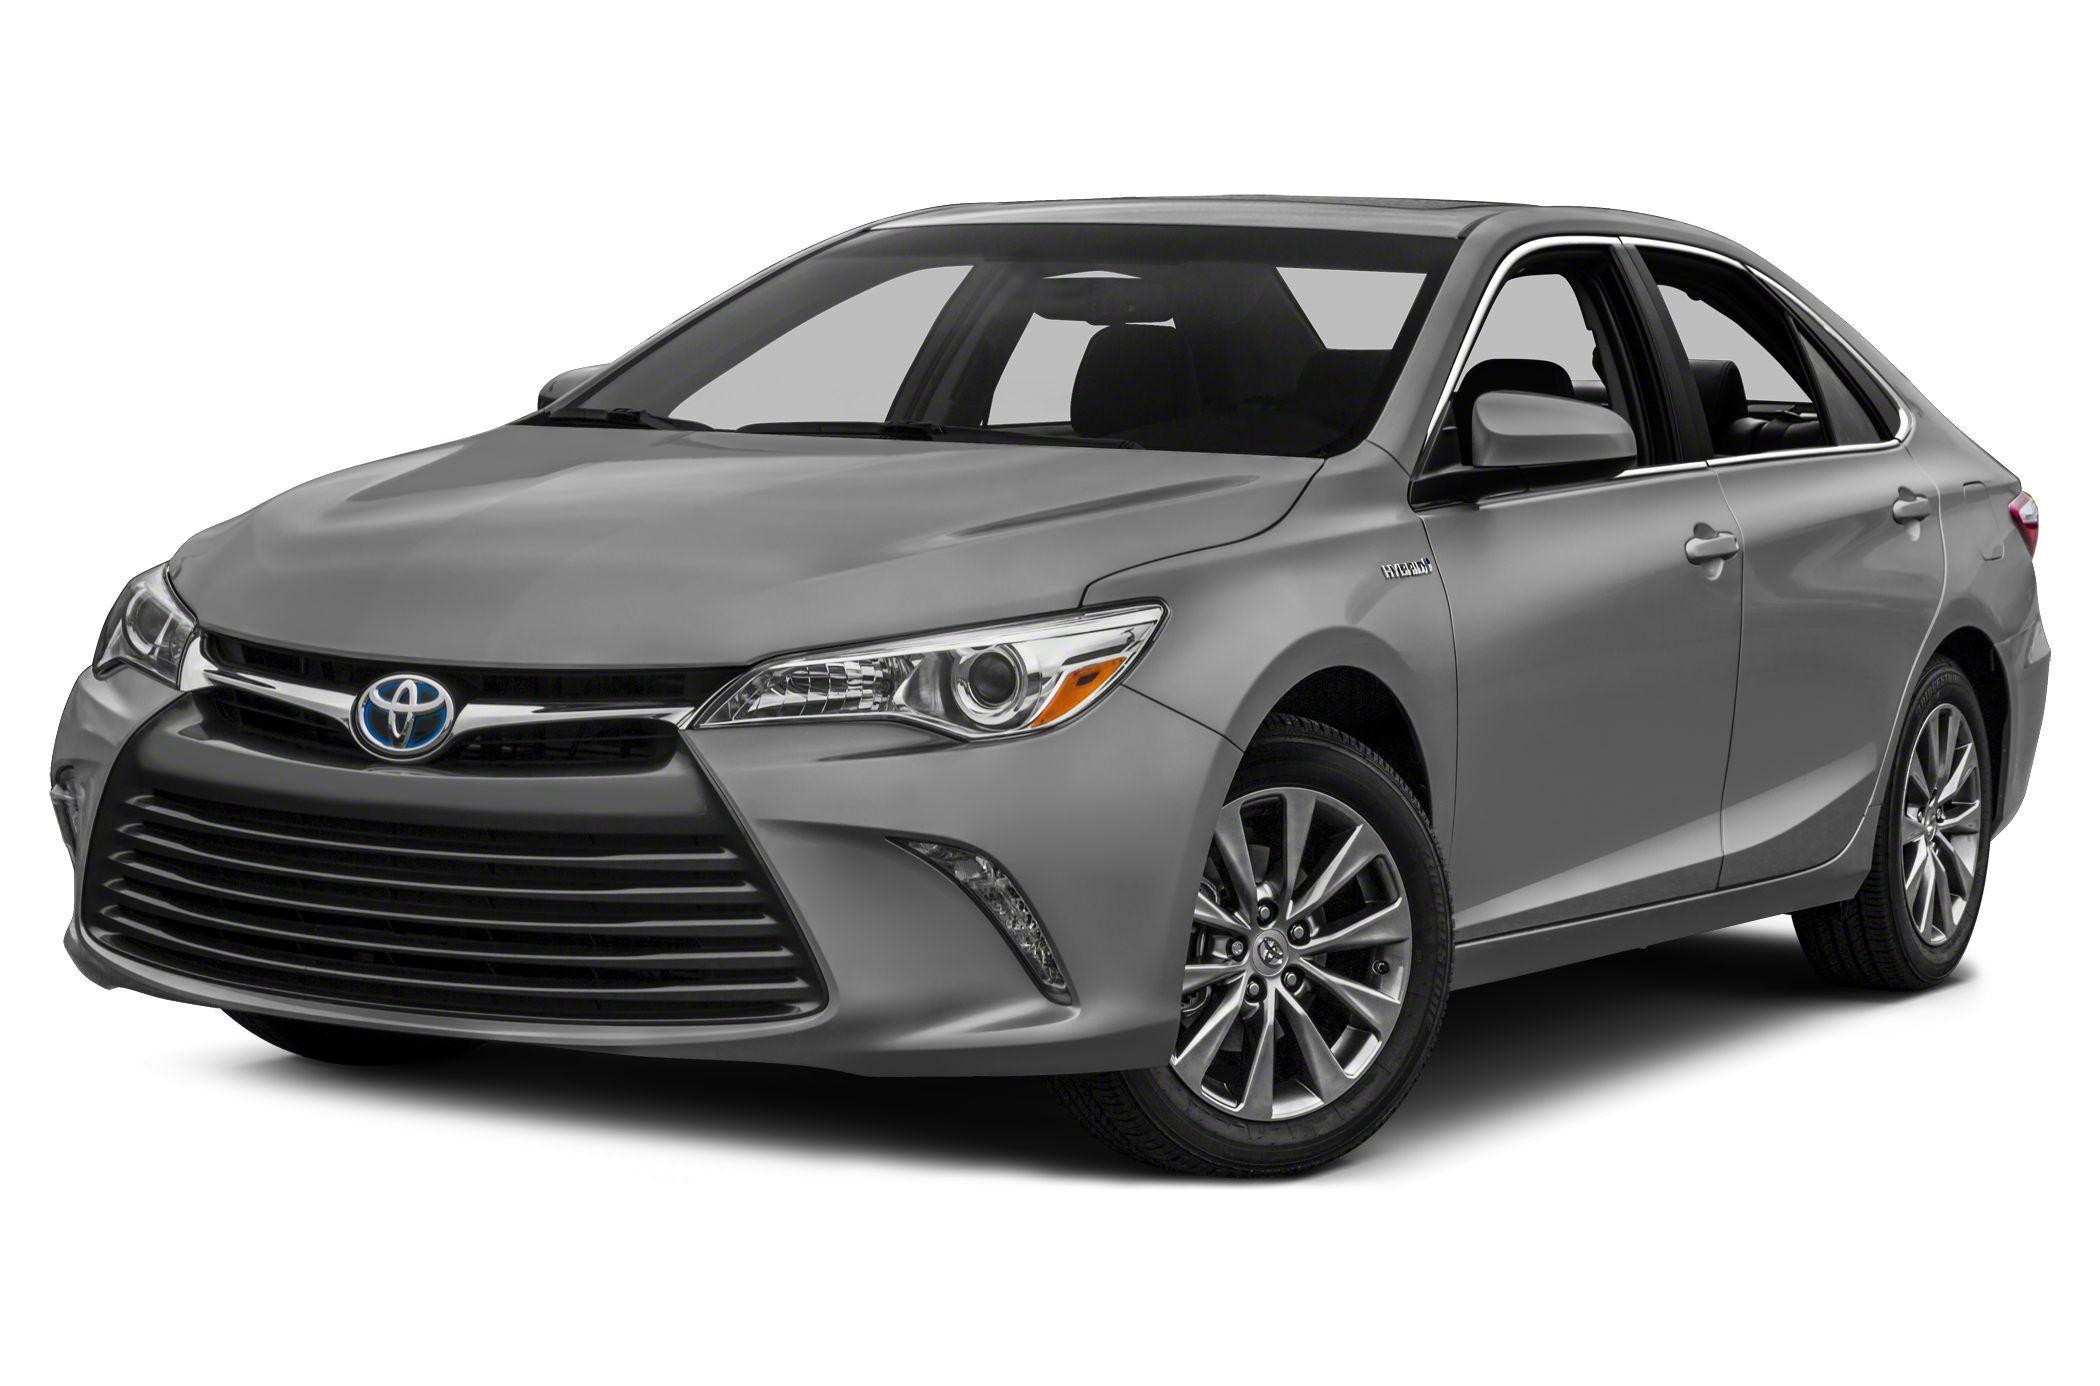 New 2017 Toyota Camry Hybrid Price Photos Reviews